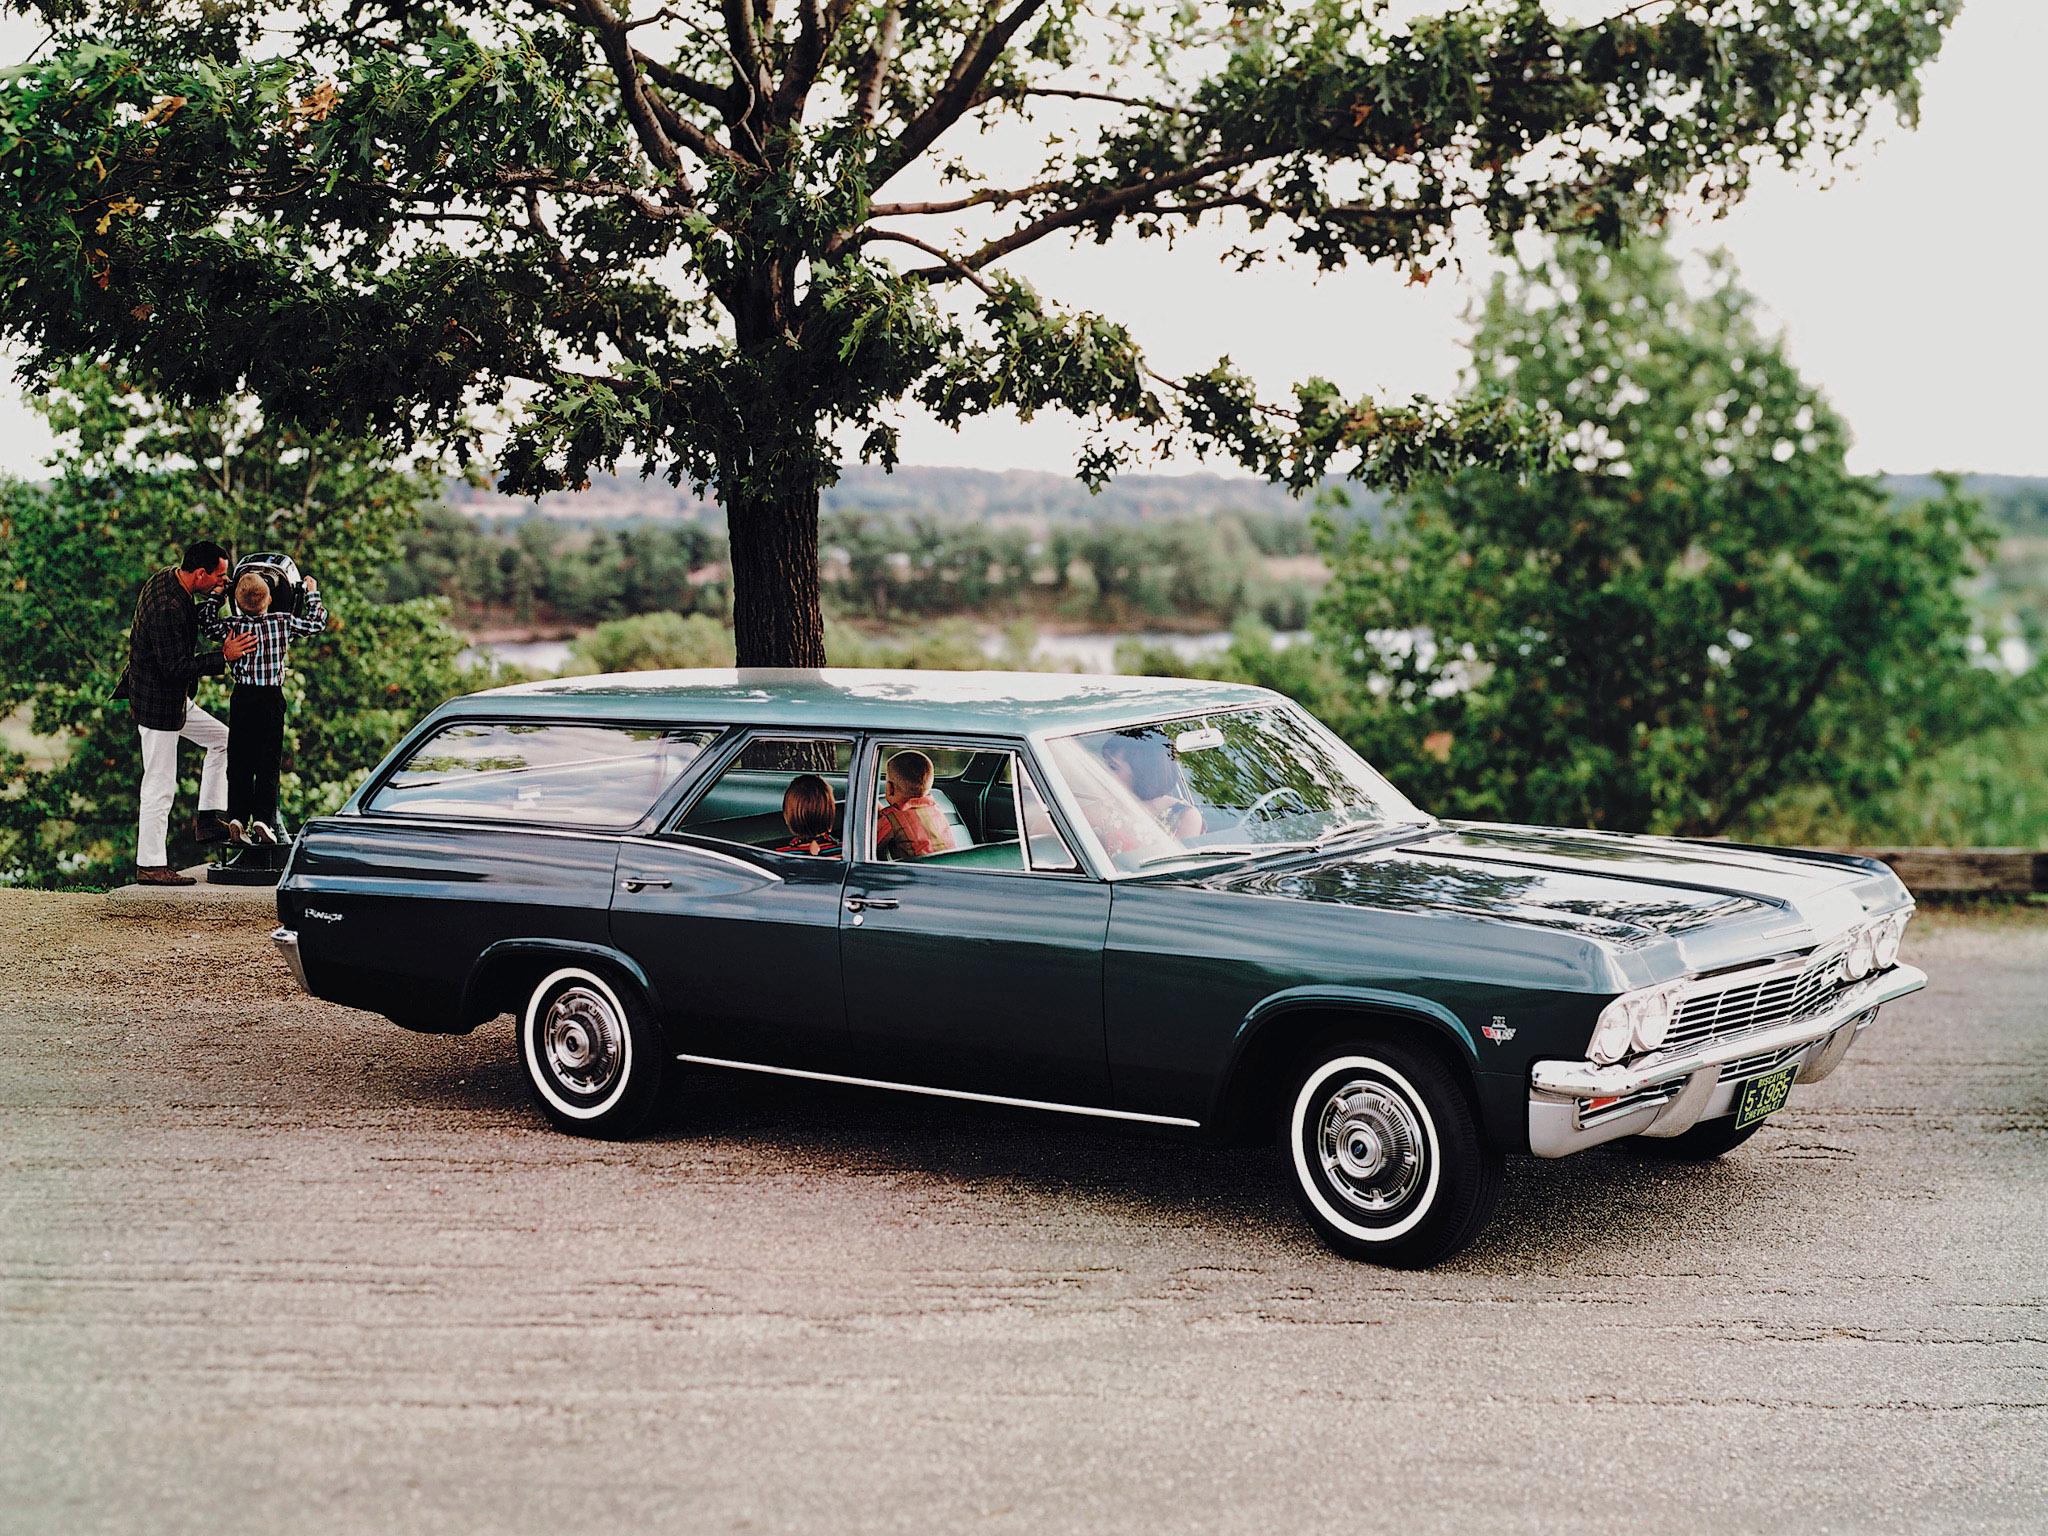 1965 Chevrolet Biscayne Stationwagon Classic Wallpaper 2048x1536 1966 Station Wagon 108584 Wallpaperup